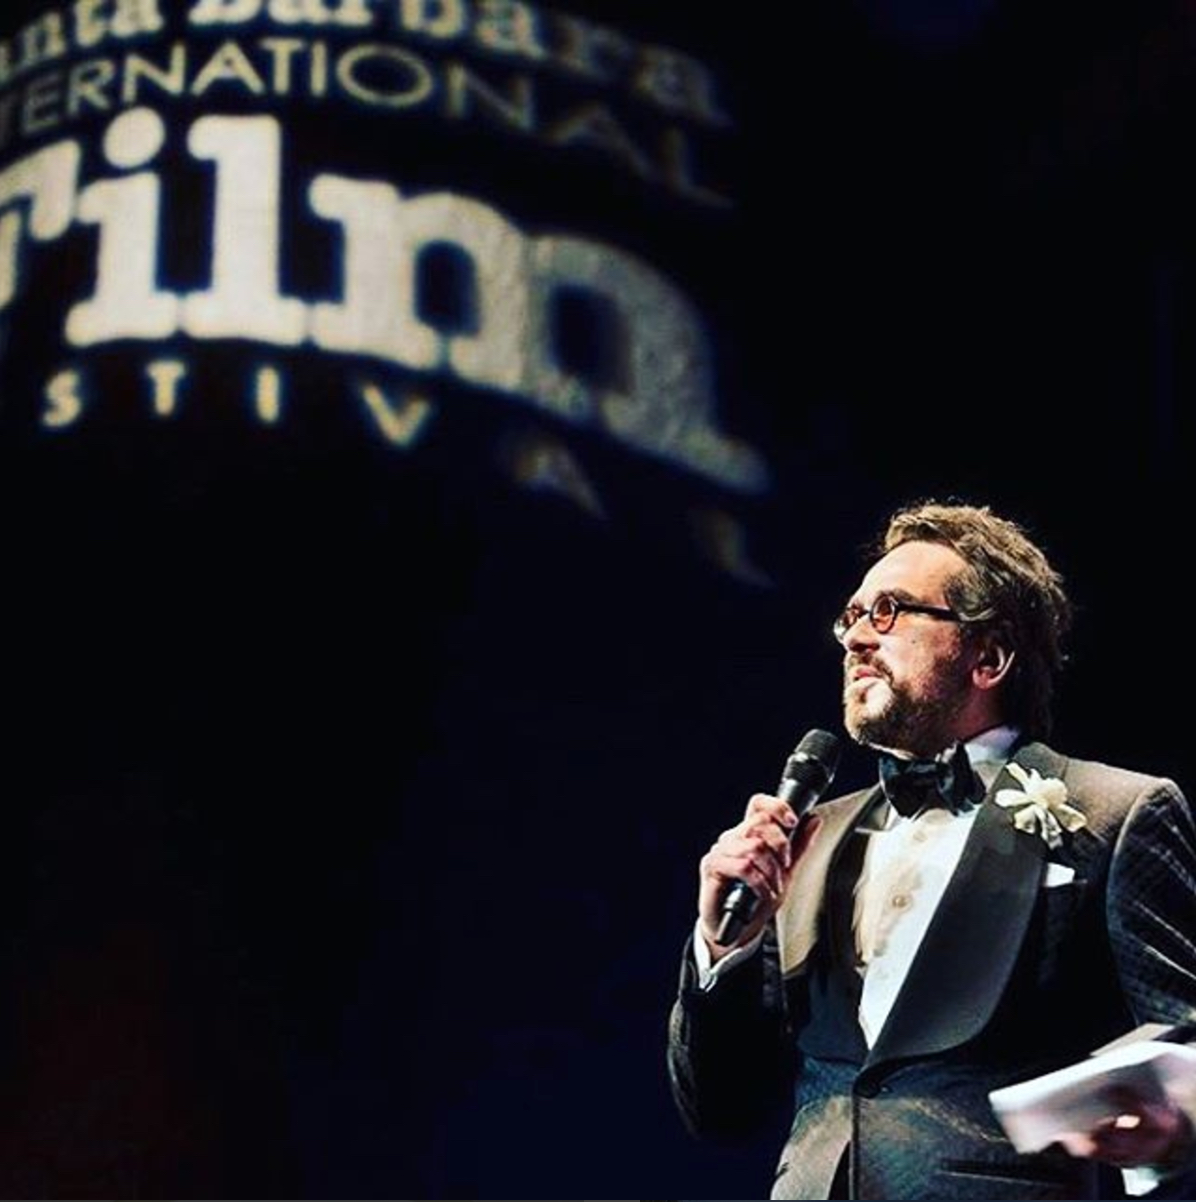 Image: Opening night of the Santa Barbabra International Film Festival - Photo by  Fritz Olenberger.